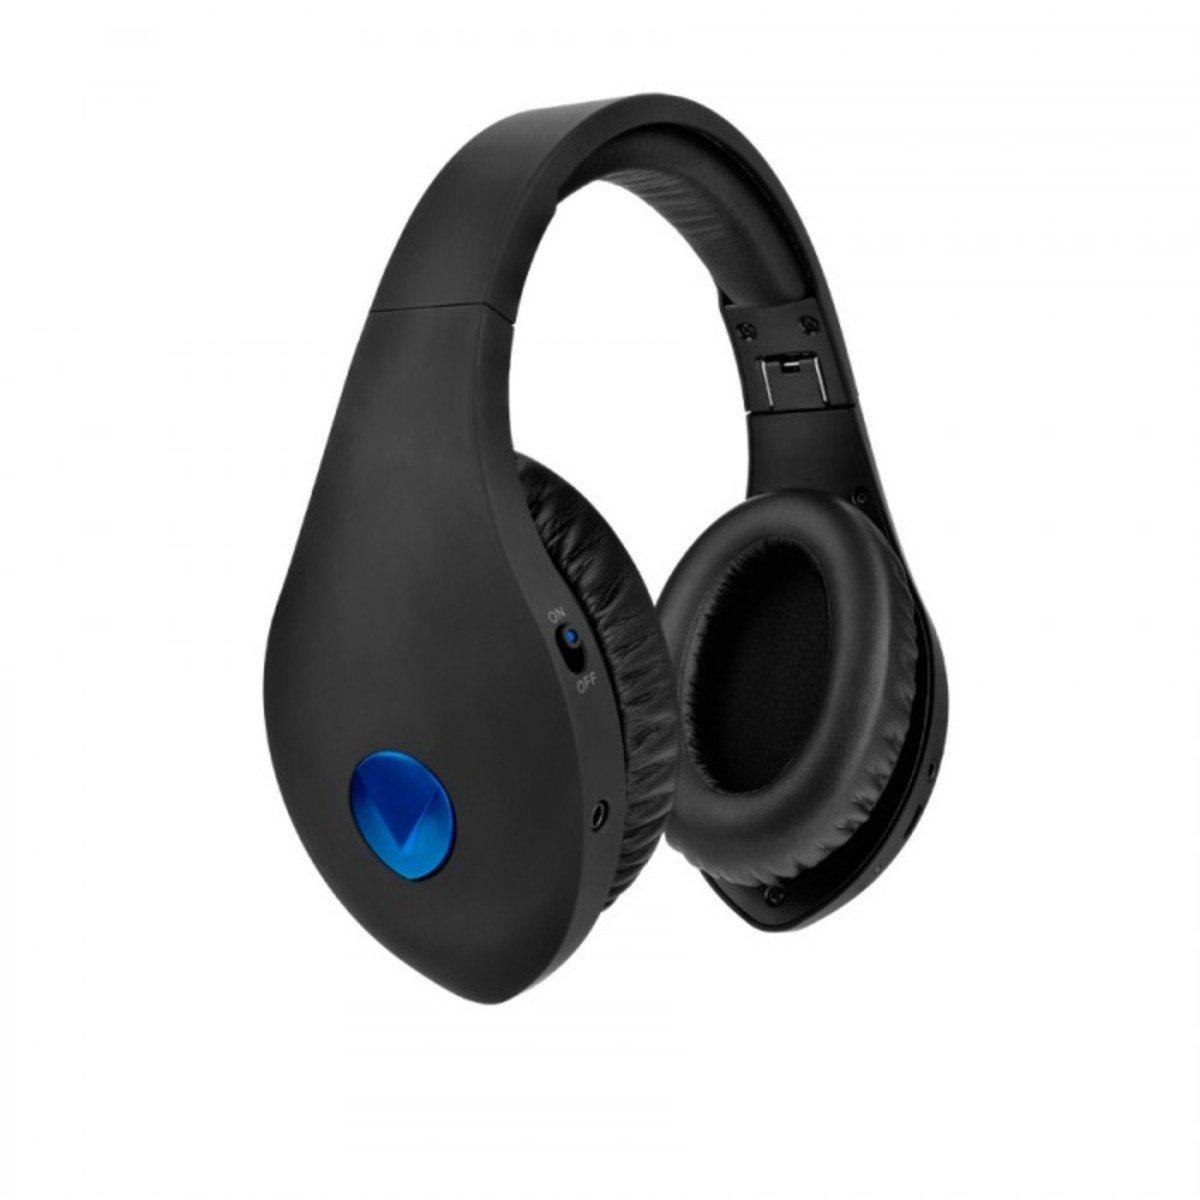 Velodyne vQuiet Over-Ear Noise Cancelling Headphones Black